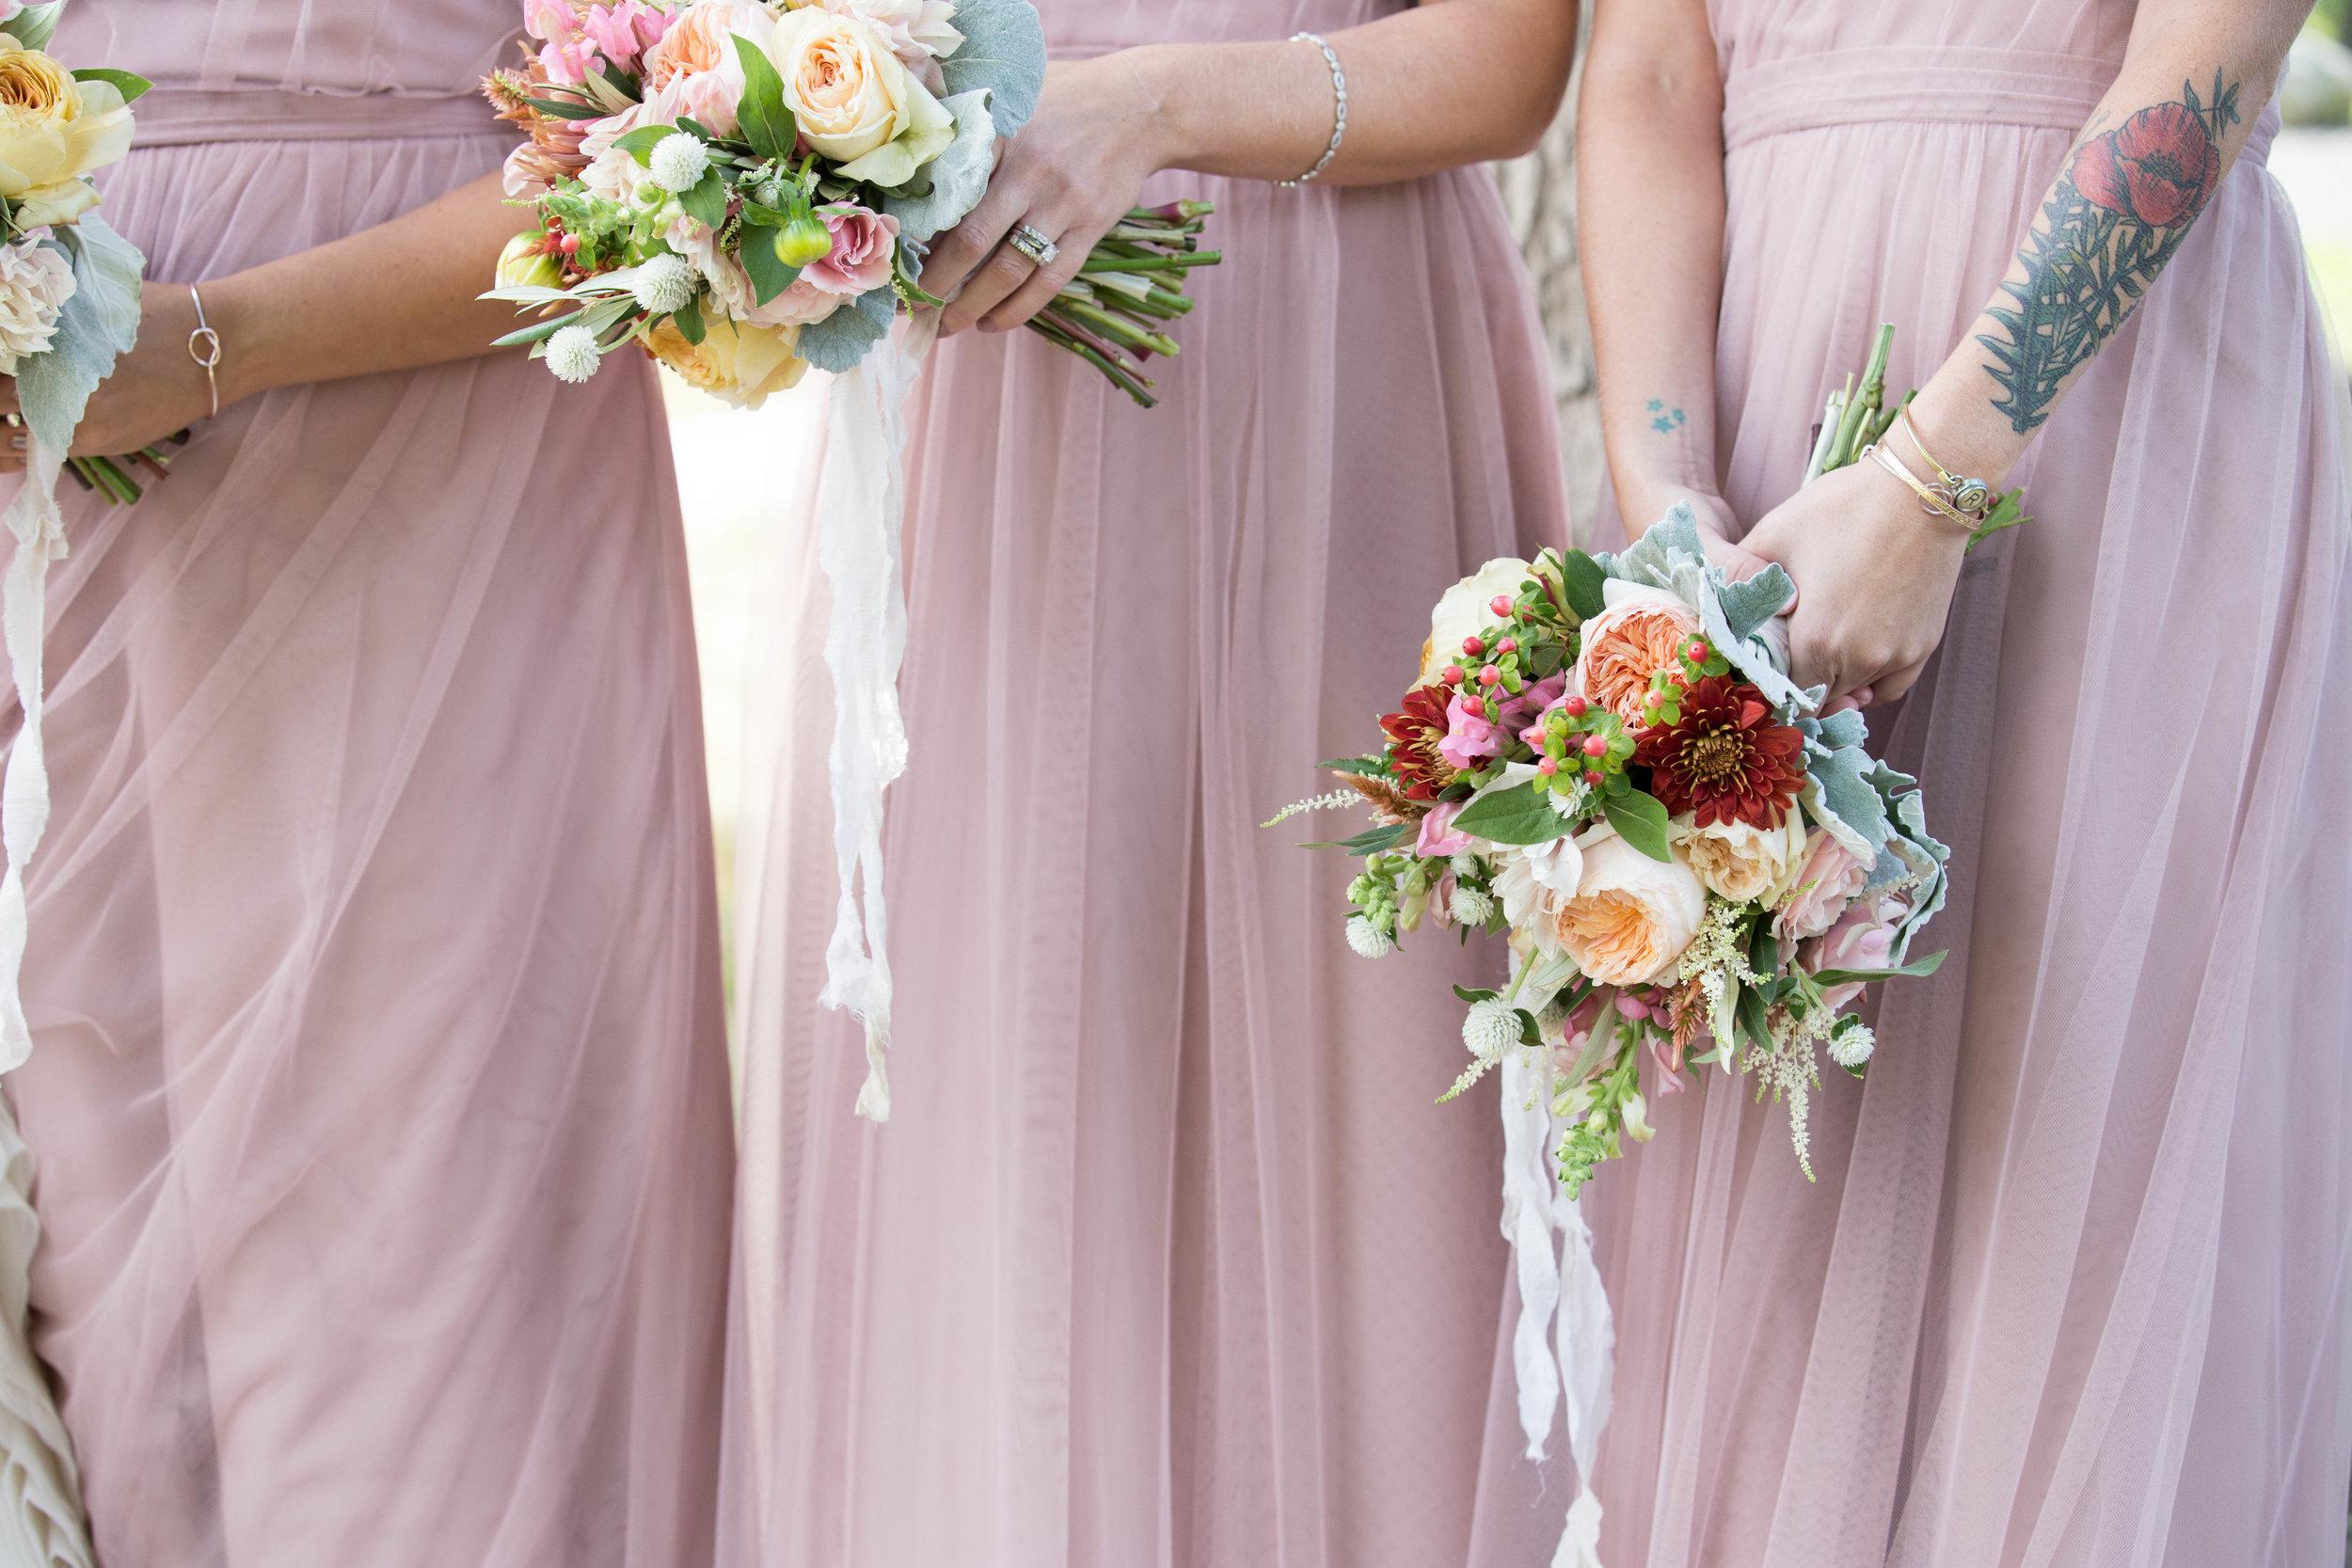 Philadelphia-Wedding-Planner-Heart-And-Dash-NicoleConnor-DrewNoelPhotography-1600.jpg